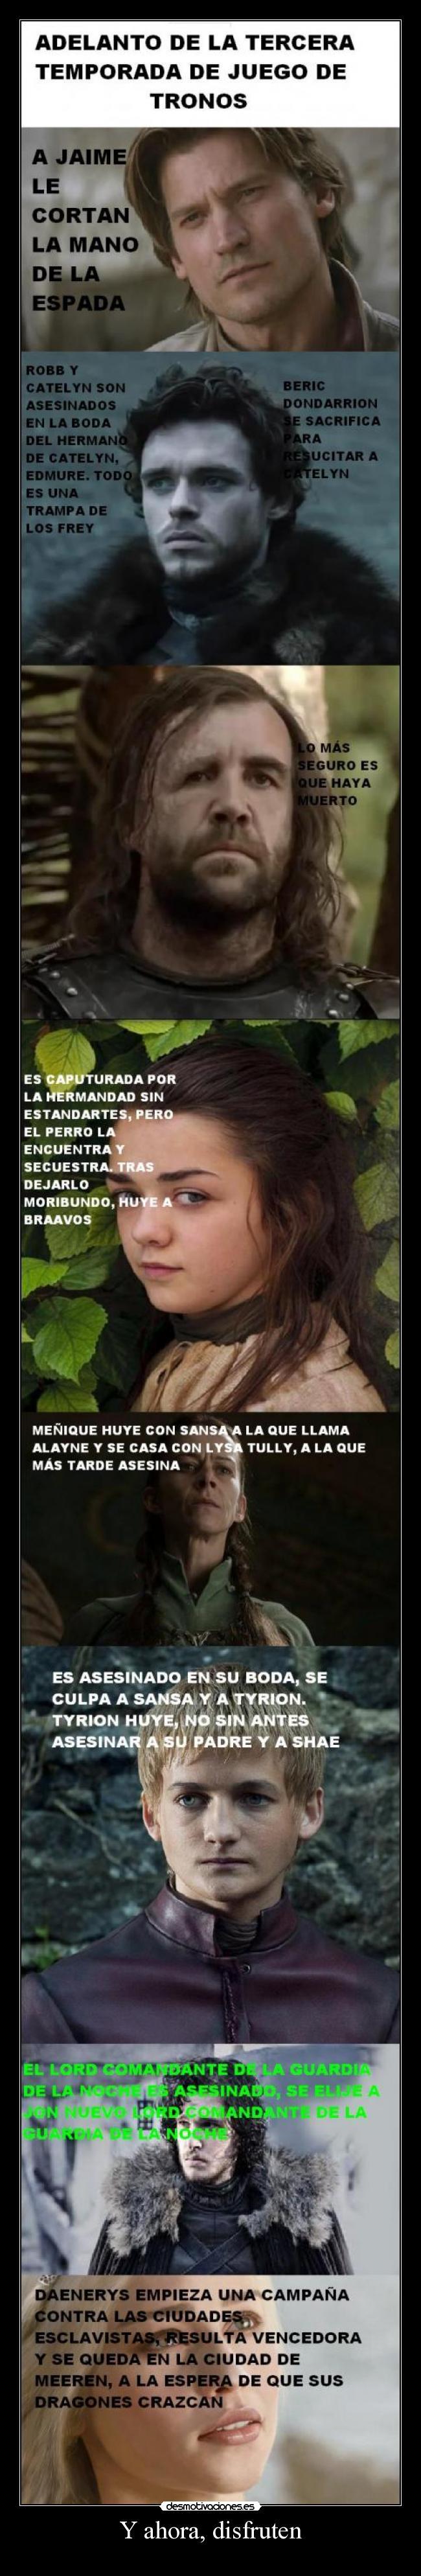 http://img.desmotivaciones.es/201303/A_Big_A_3.jpg